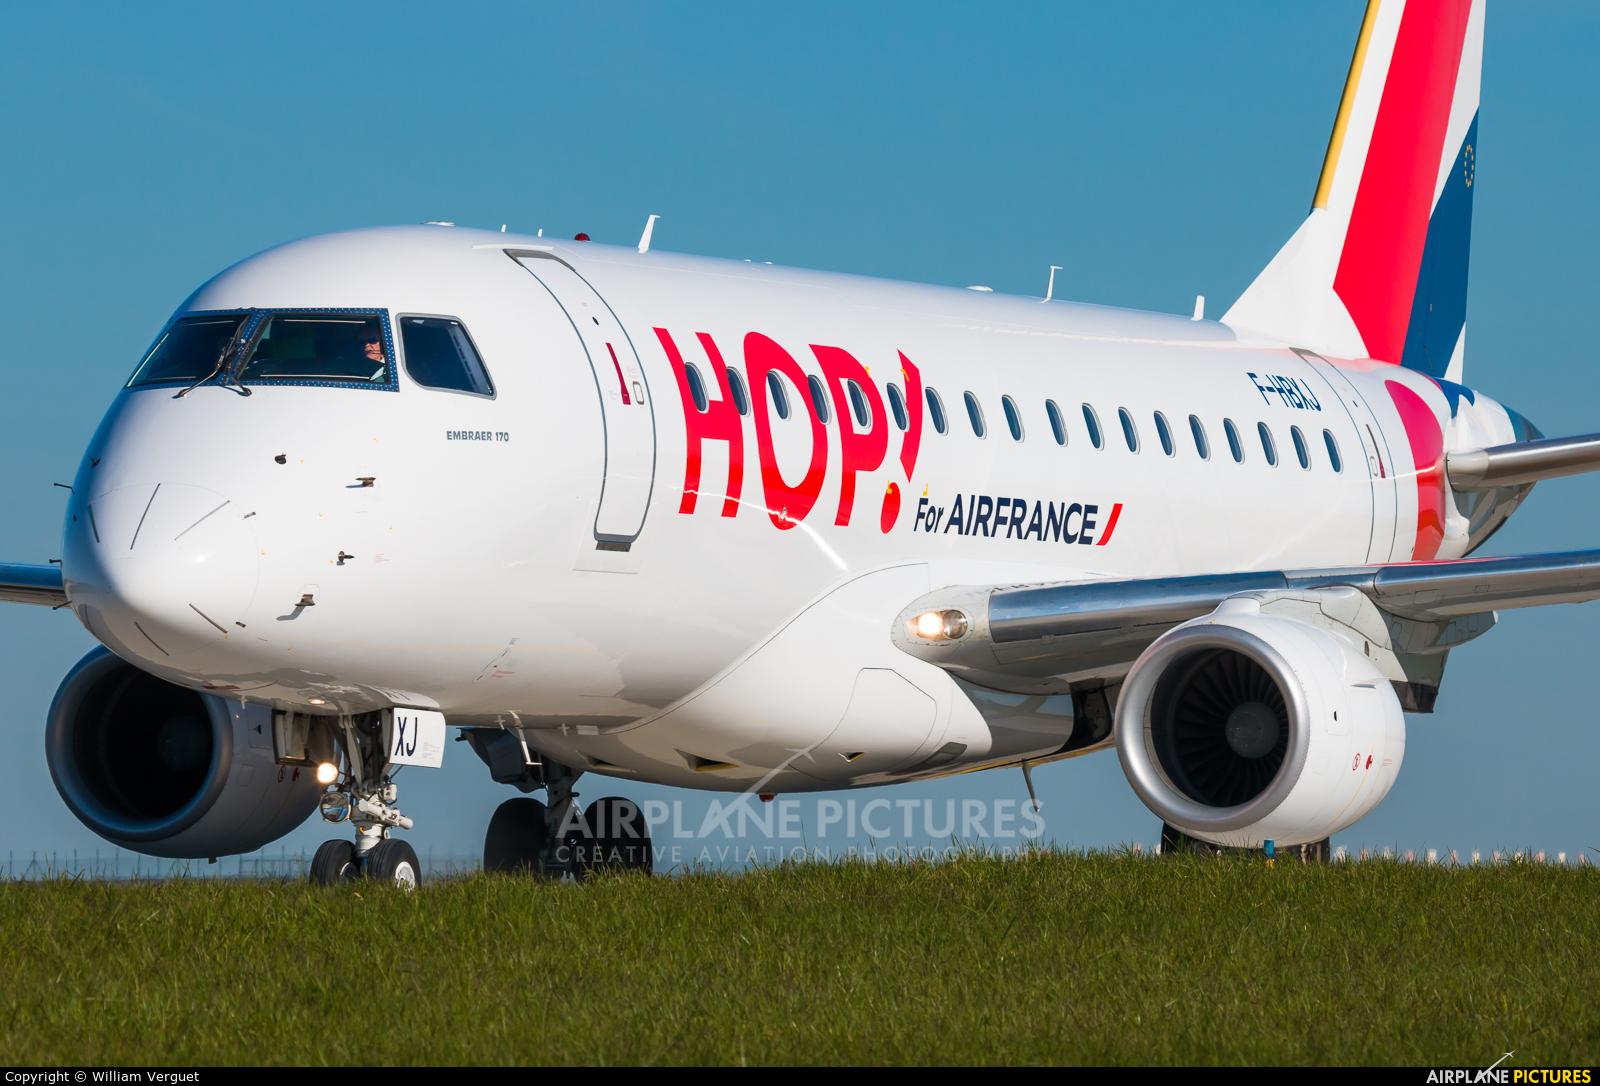 Air France - Hop! F-HBXJ aircraft at Paris - Charles de Gaulle